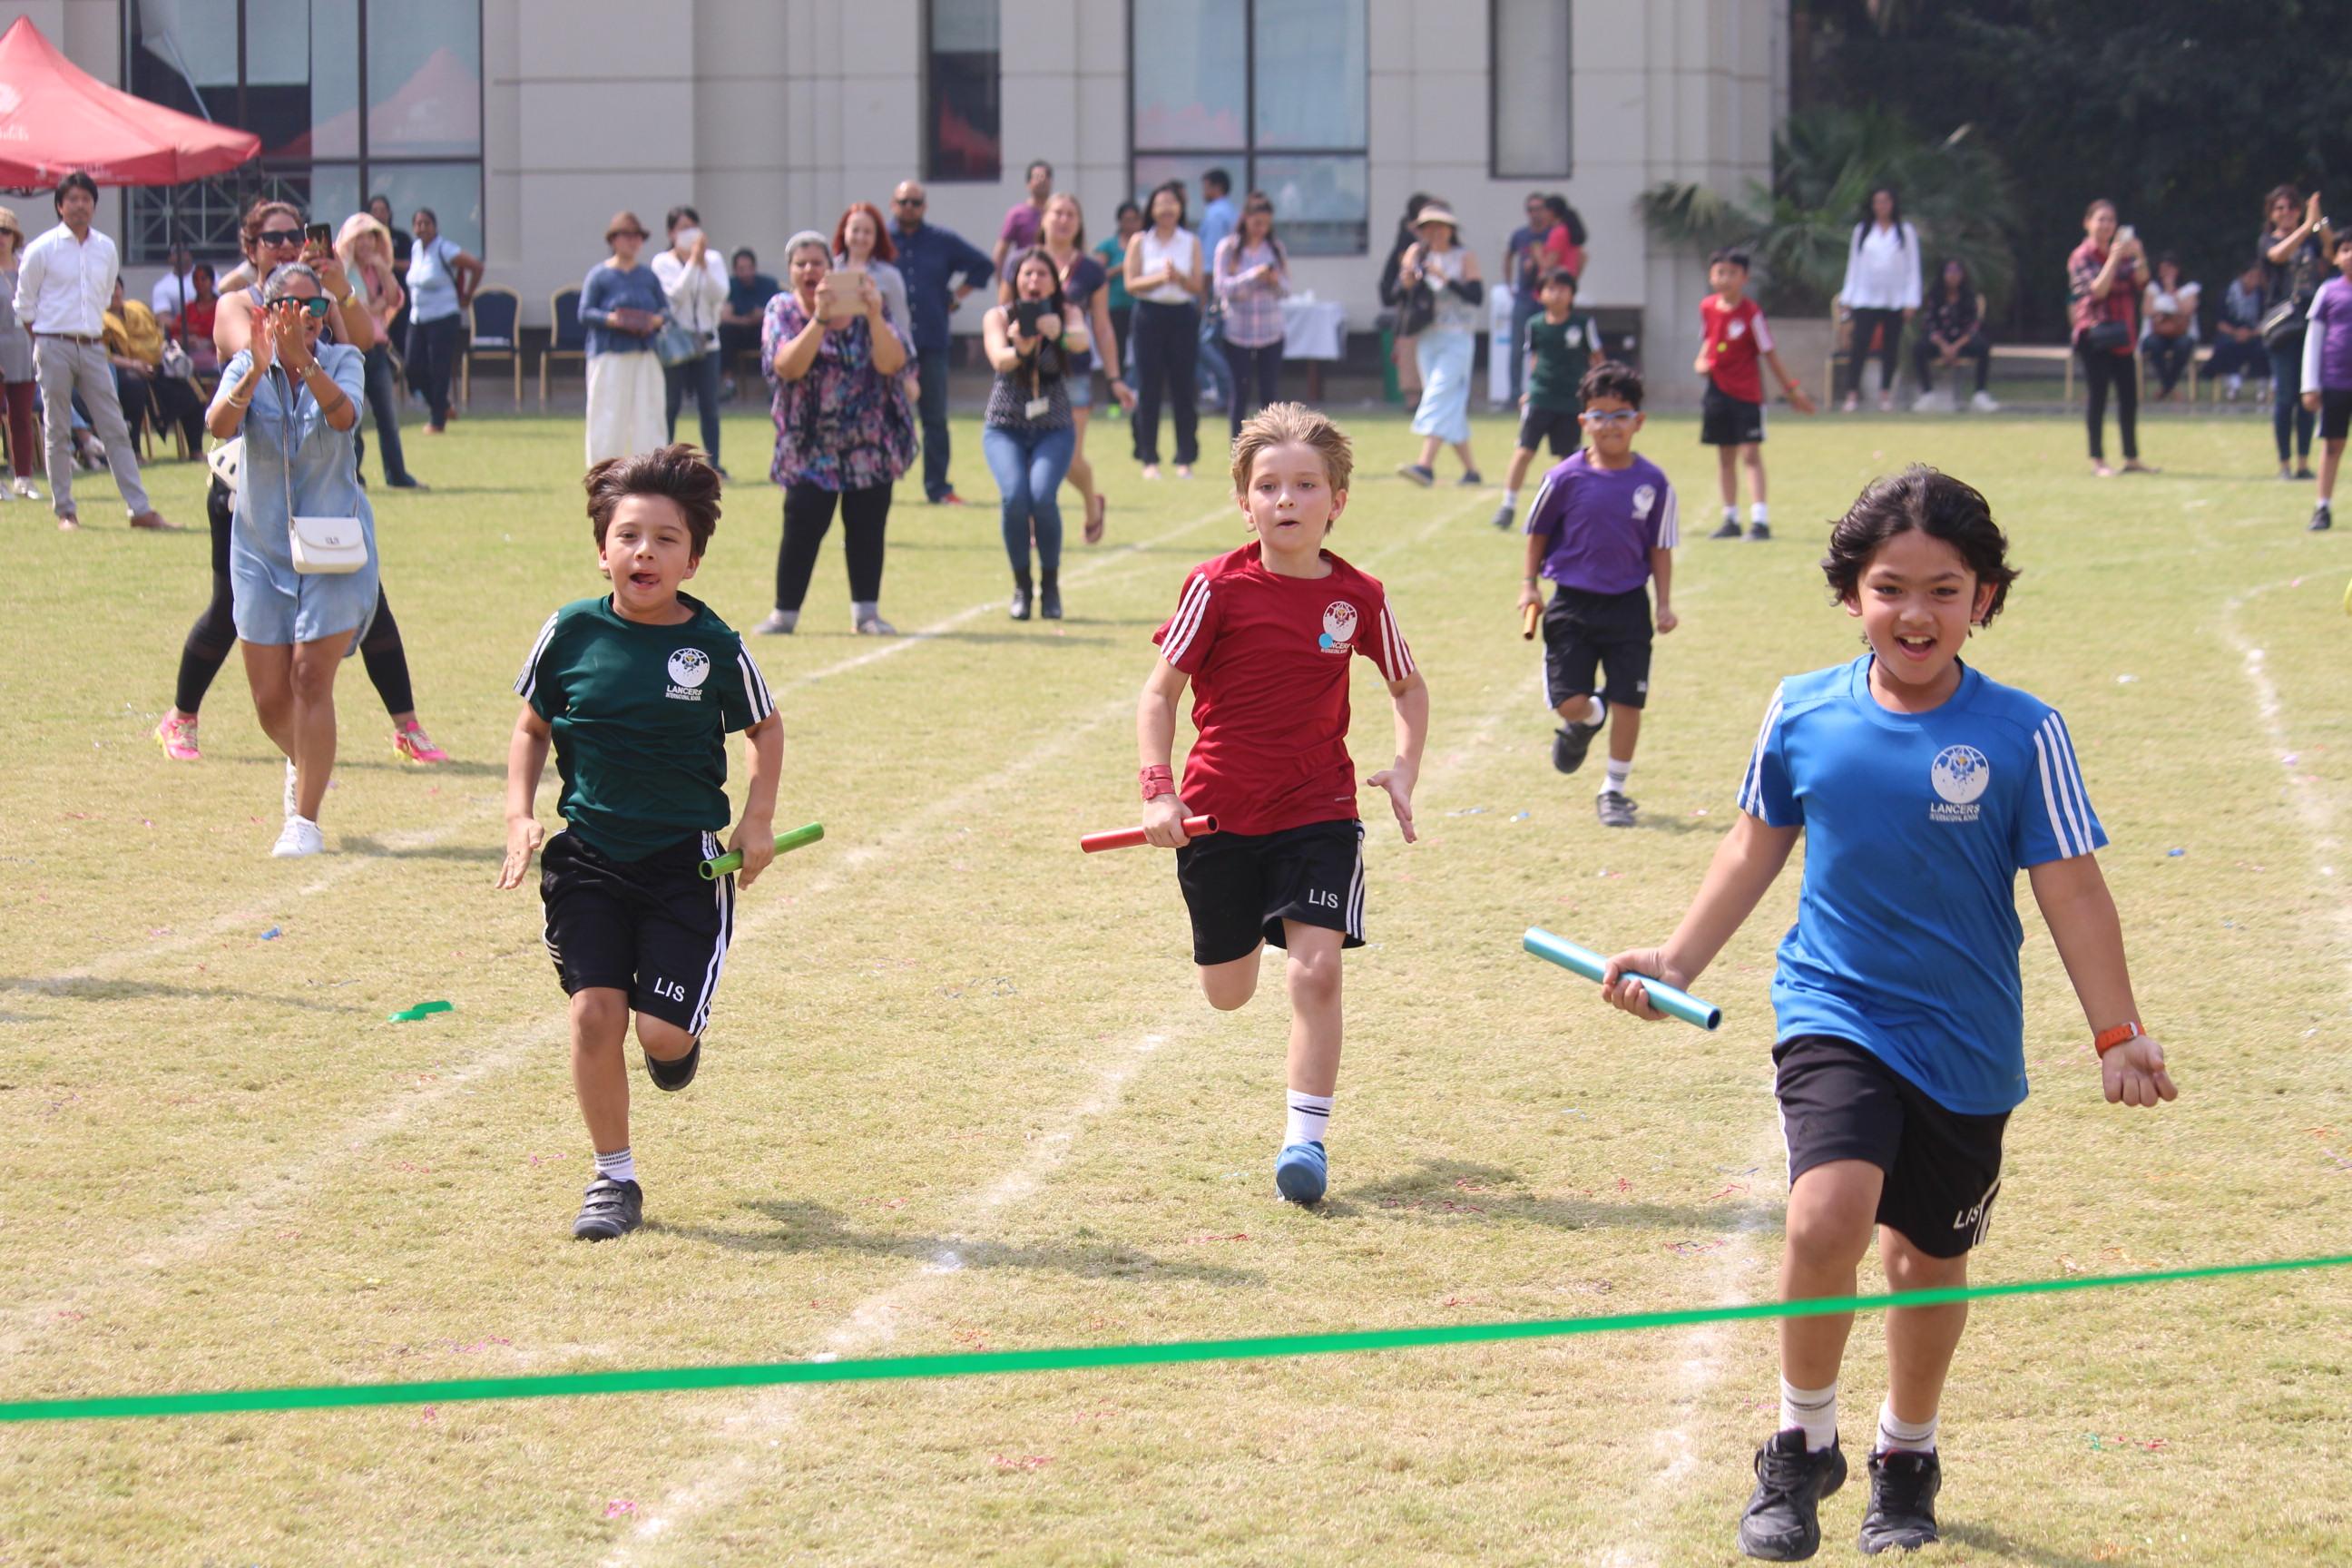 PYP Sports Day